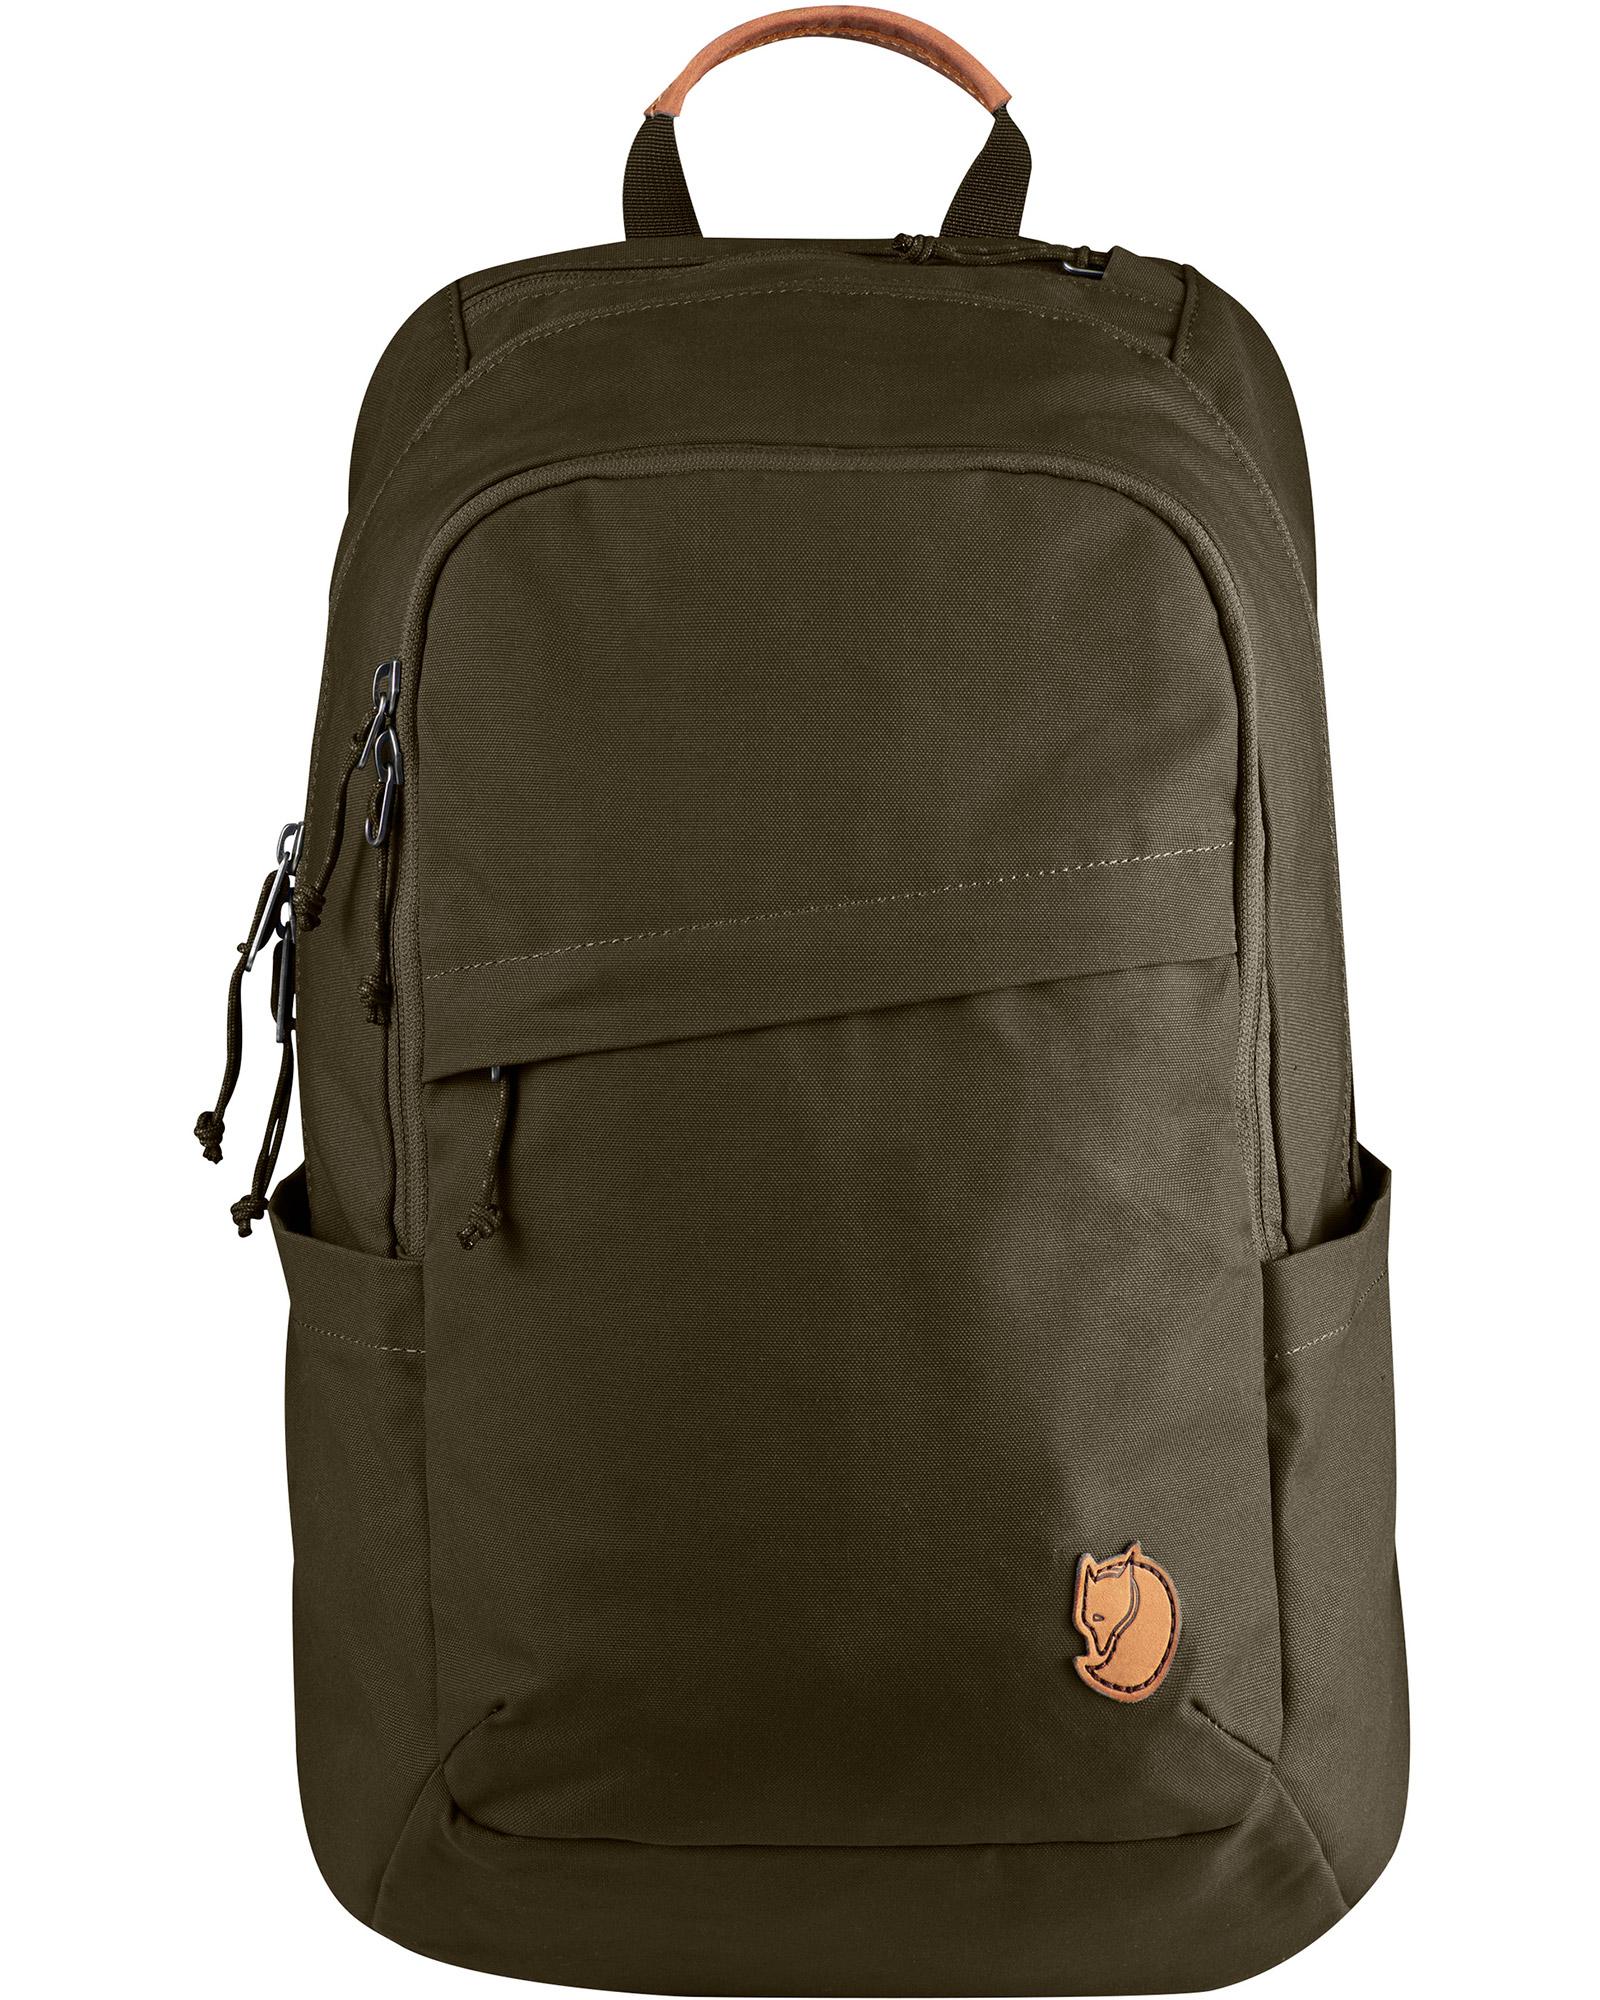 Fjallraven Raven 20L G-1000 HeavyDuty Eco Backpack 0